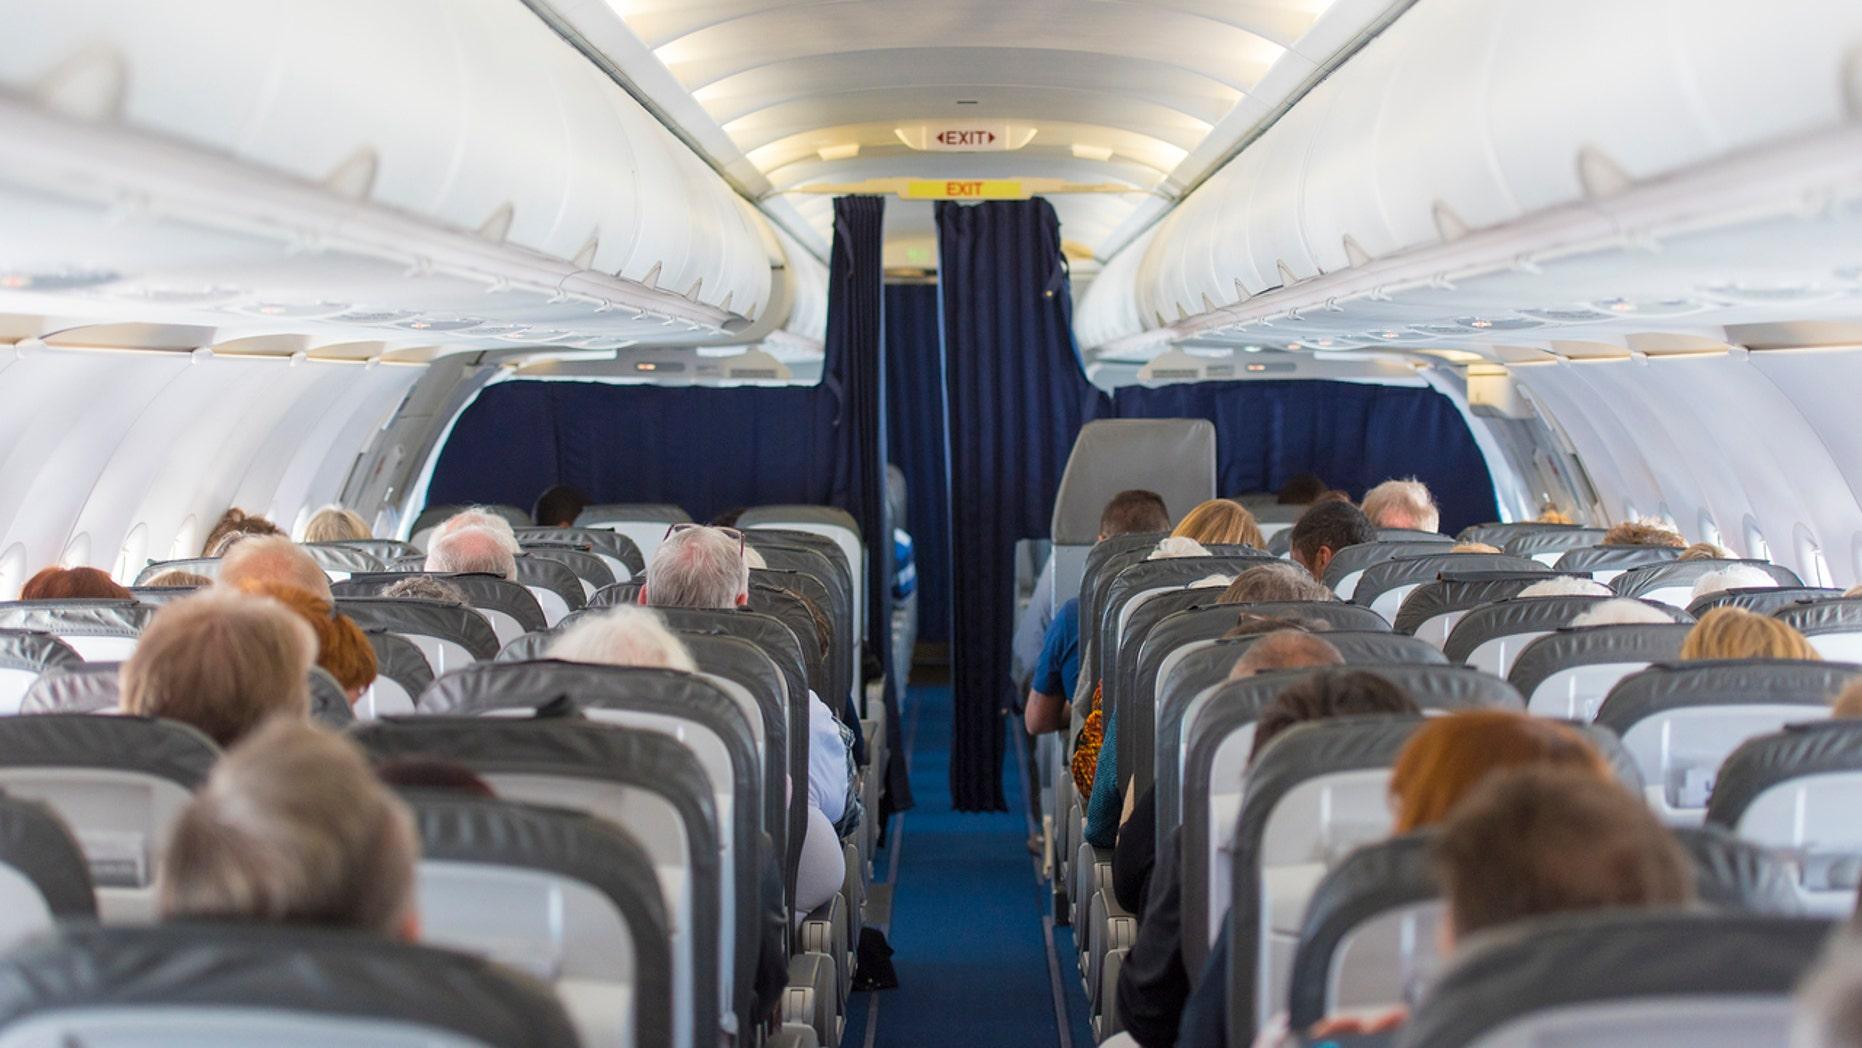 A Brazilian American got into a drunken brawl on a flight that resulted in her biting three flight attendants.